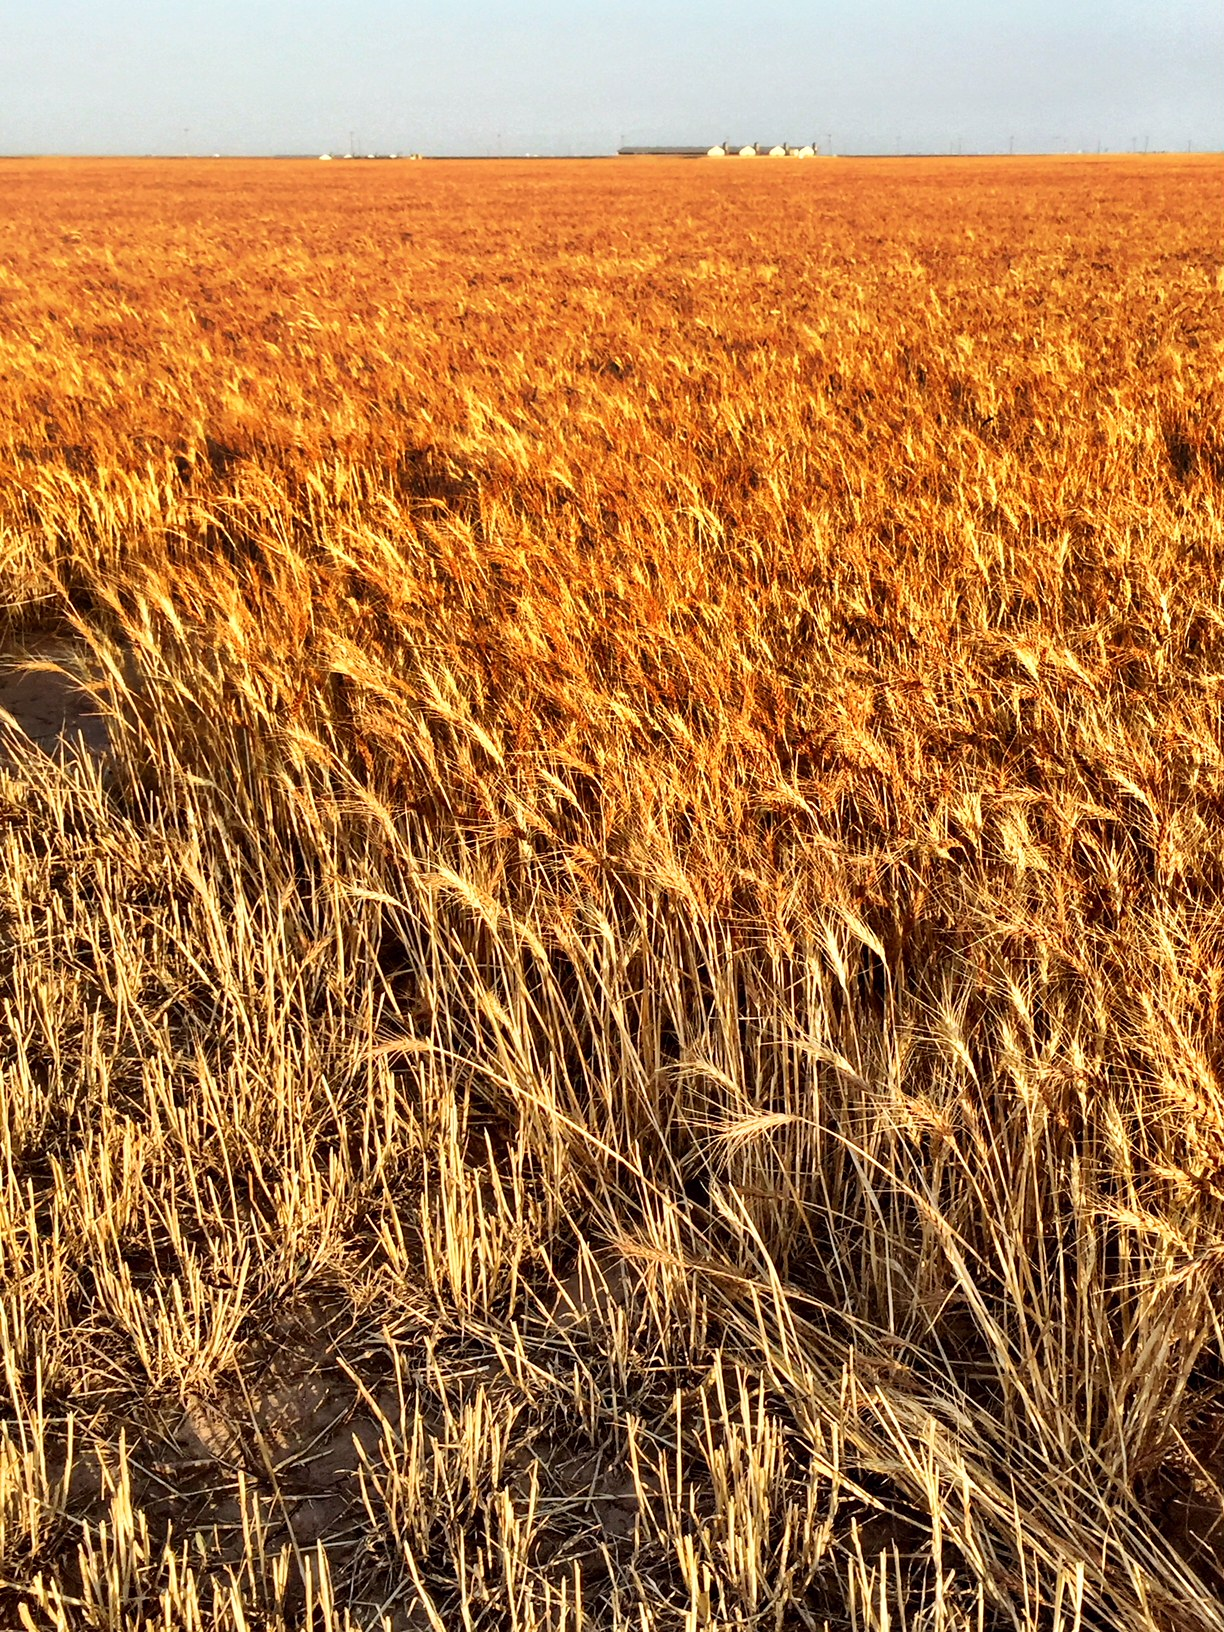 (c) Copyright Renee M. Wilmeth, Wilmeth Farms, Texas Wheat